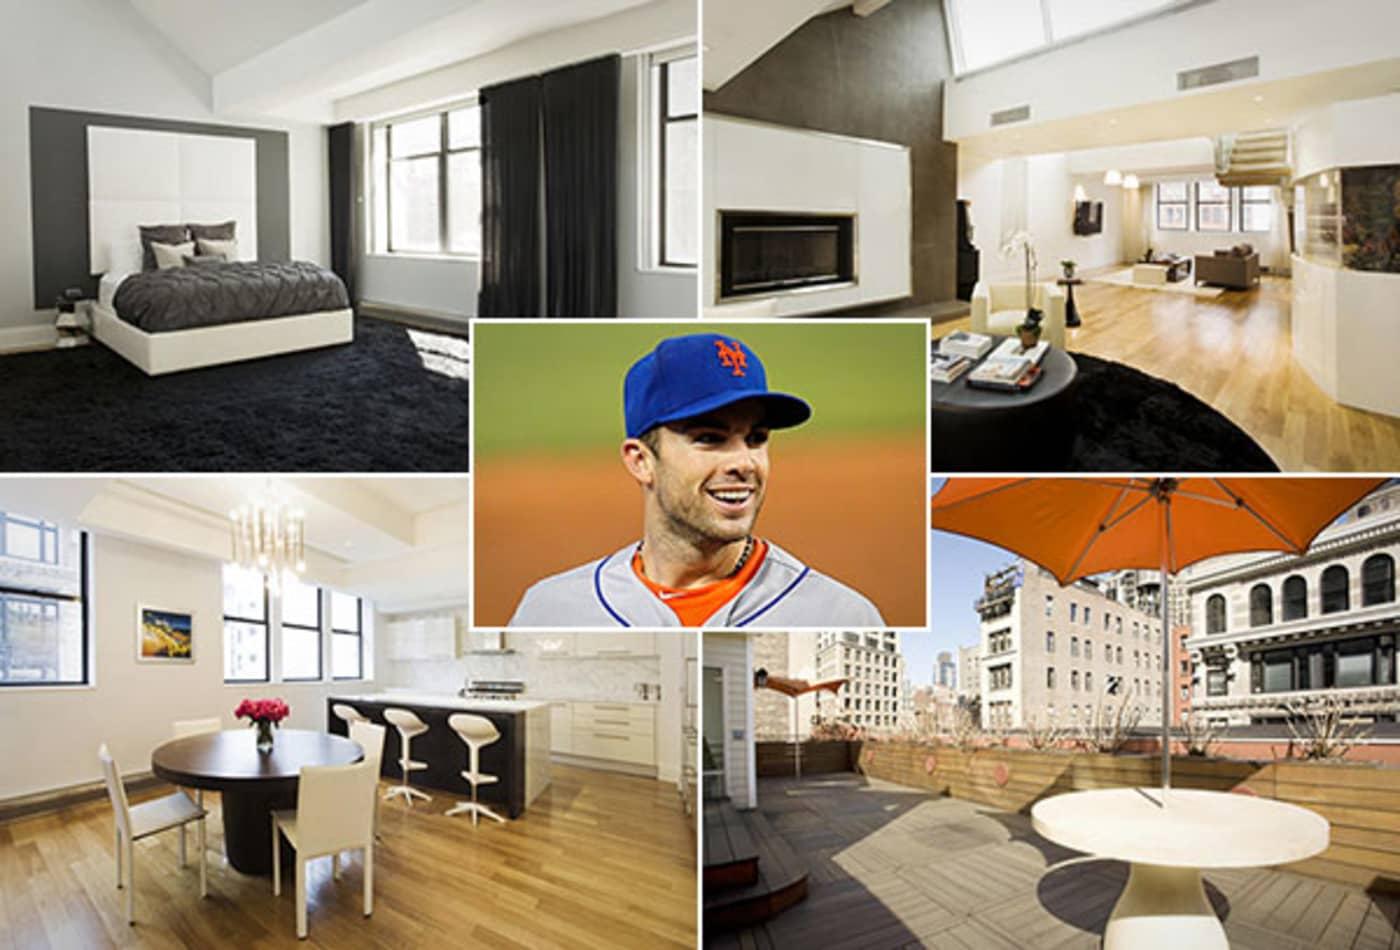 David-Wright-Coolest-Athlete-Homes.jpg